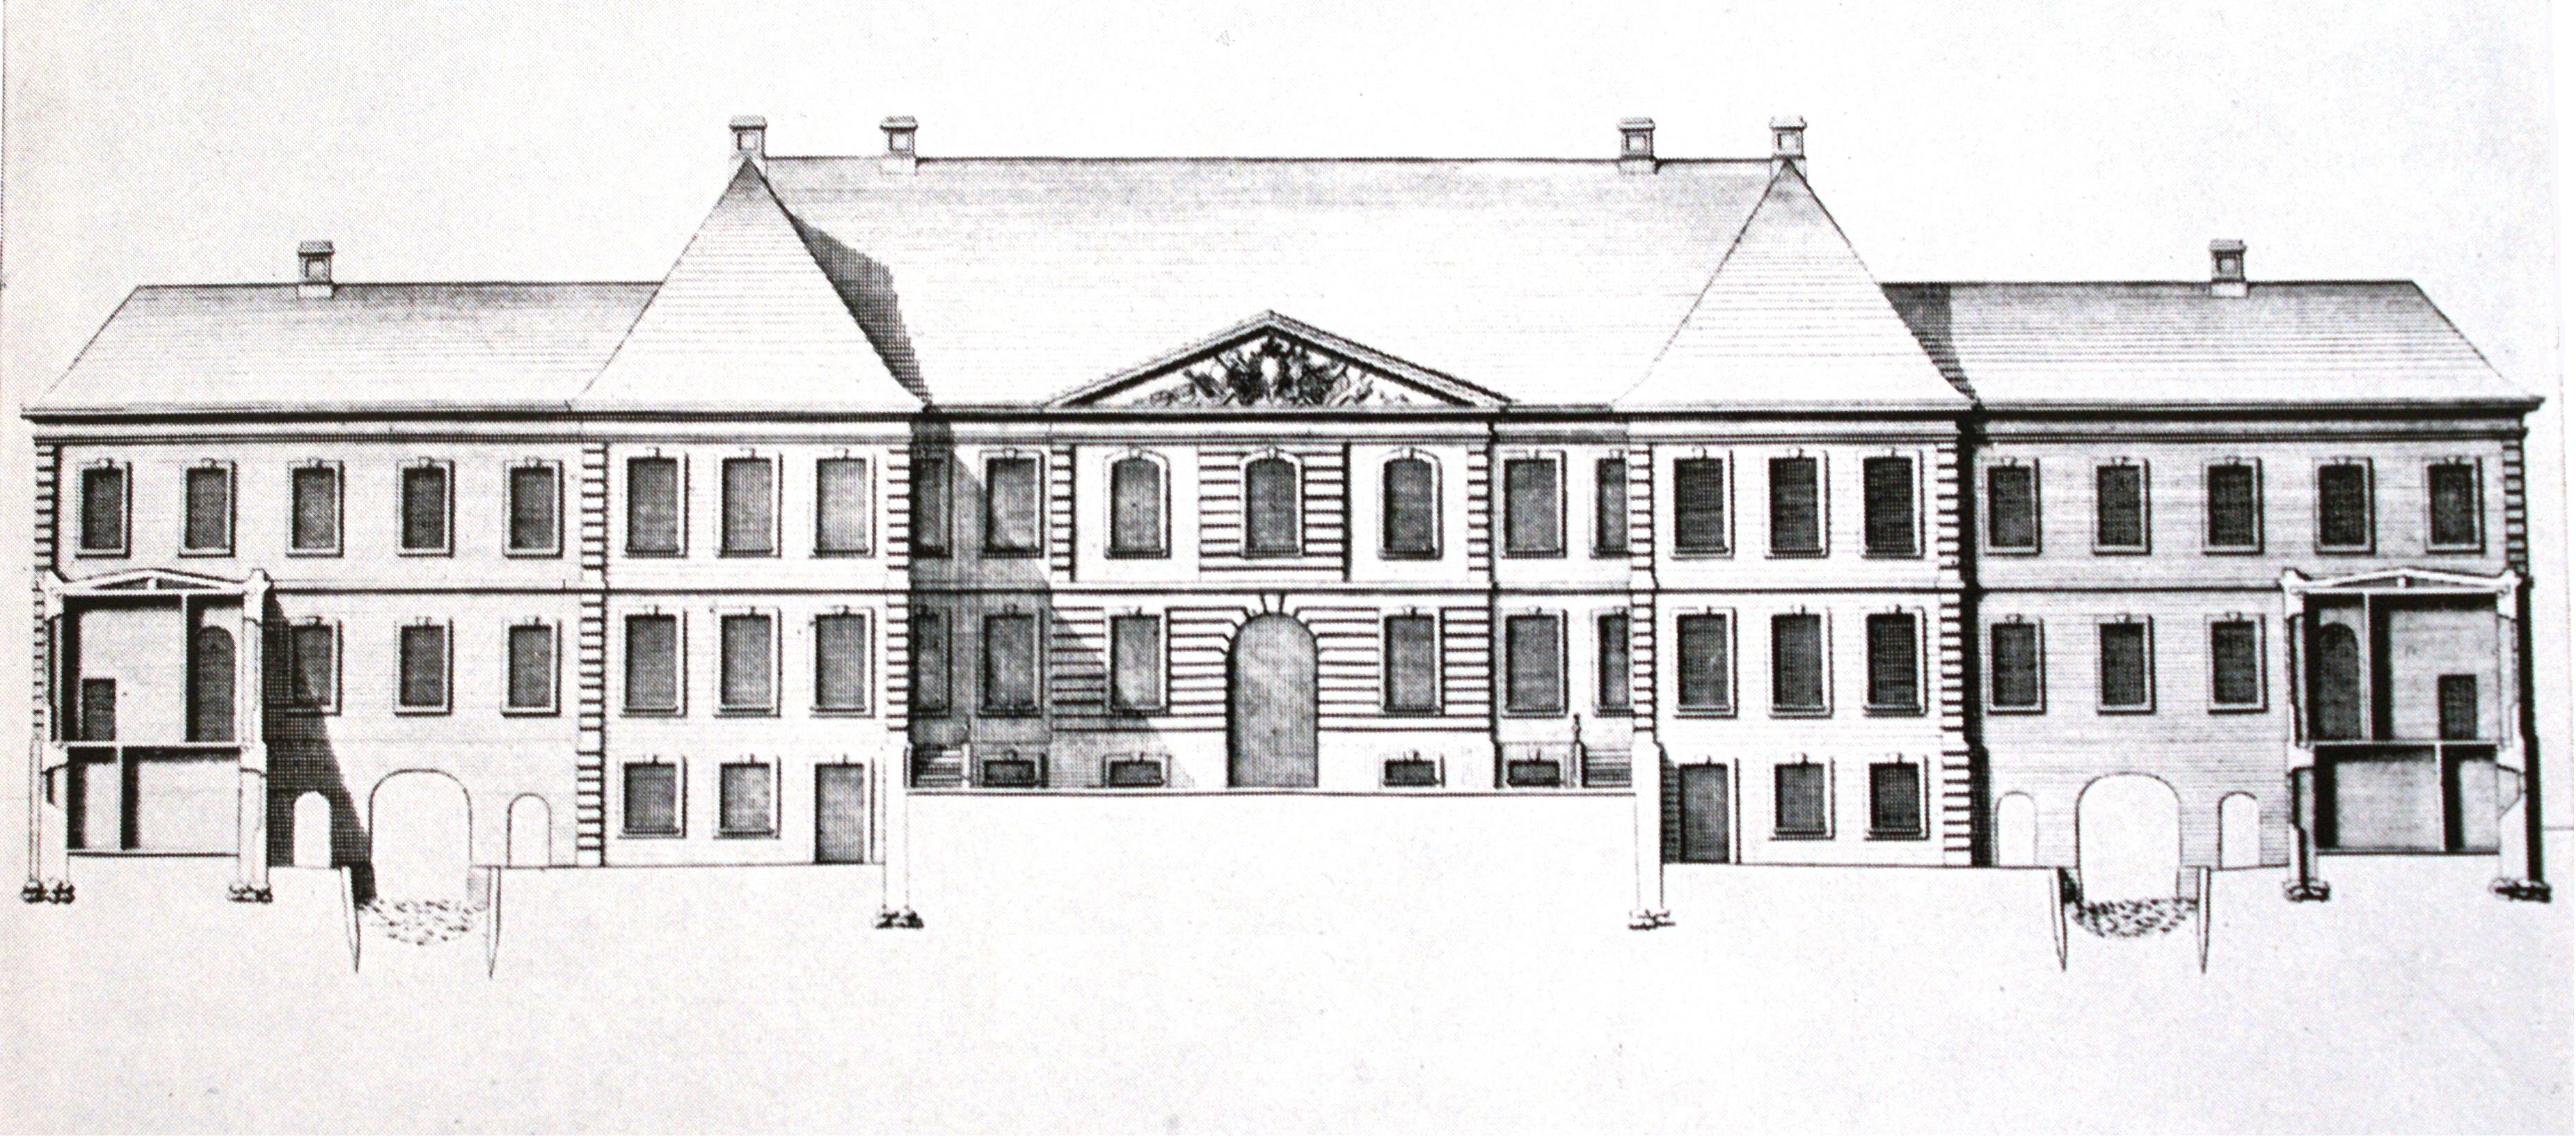 Schloss friedrichsruh drage wikiwand for Buckingham choice floor plans